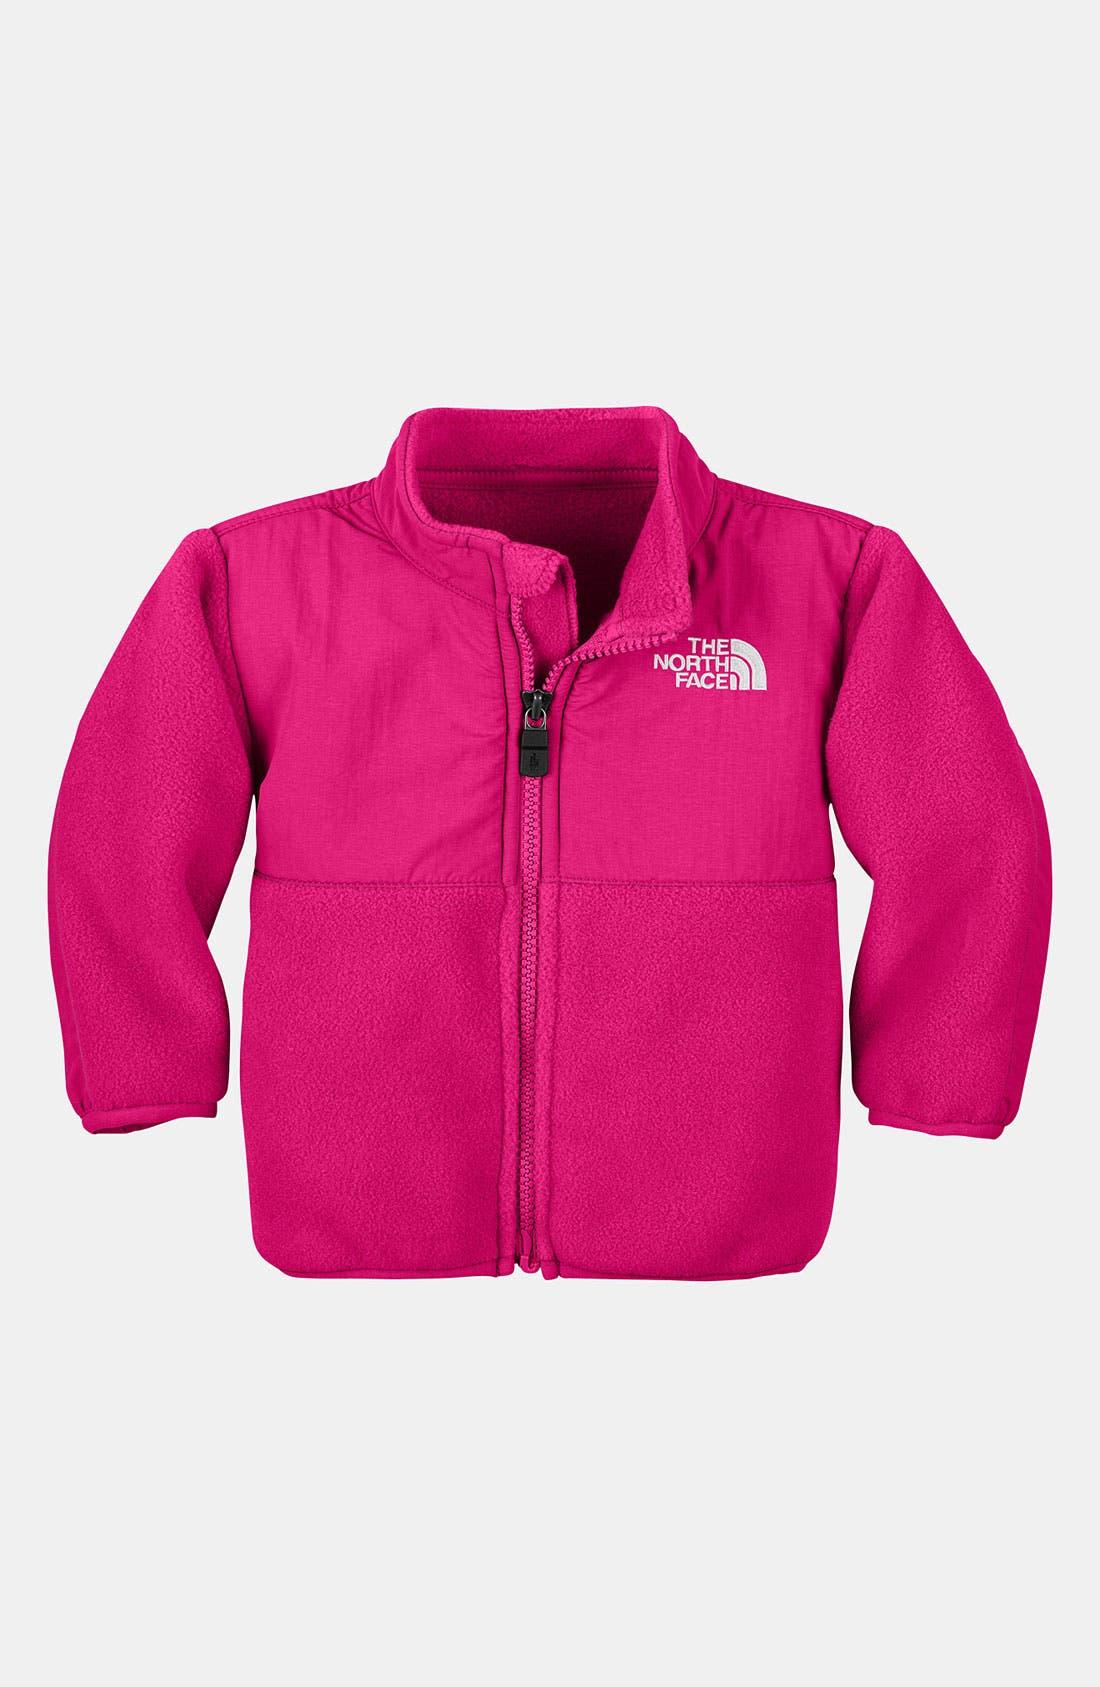 Alternate Image 1 Selected - The North Face 'Denali' Jacket (Infant)